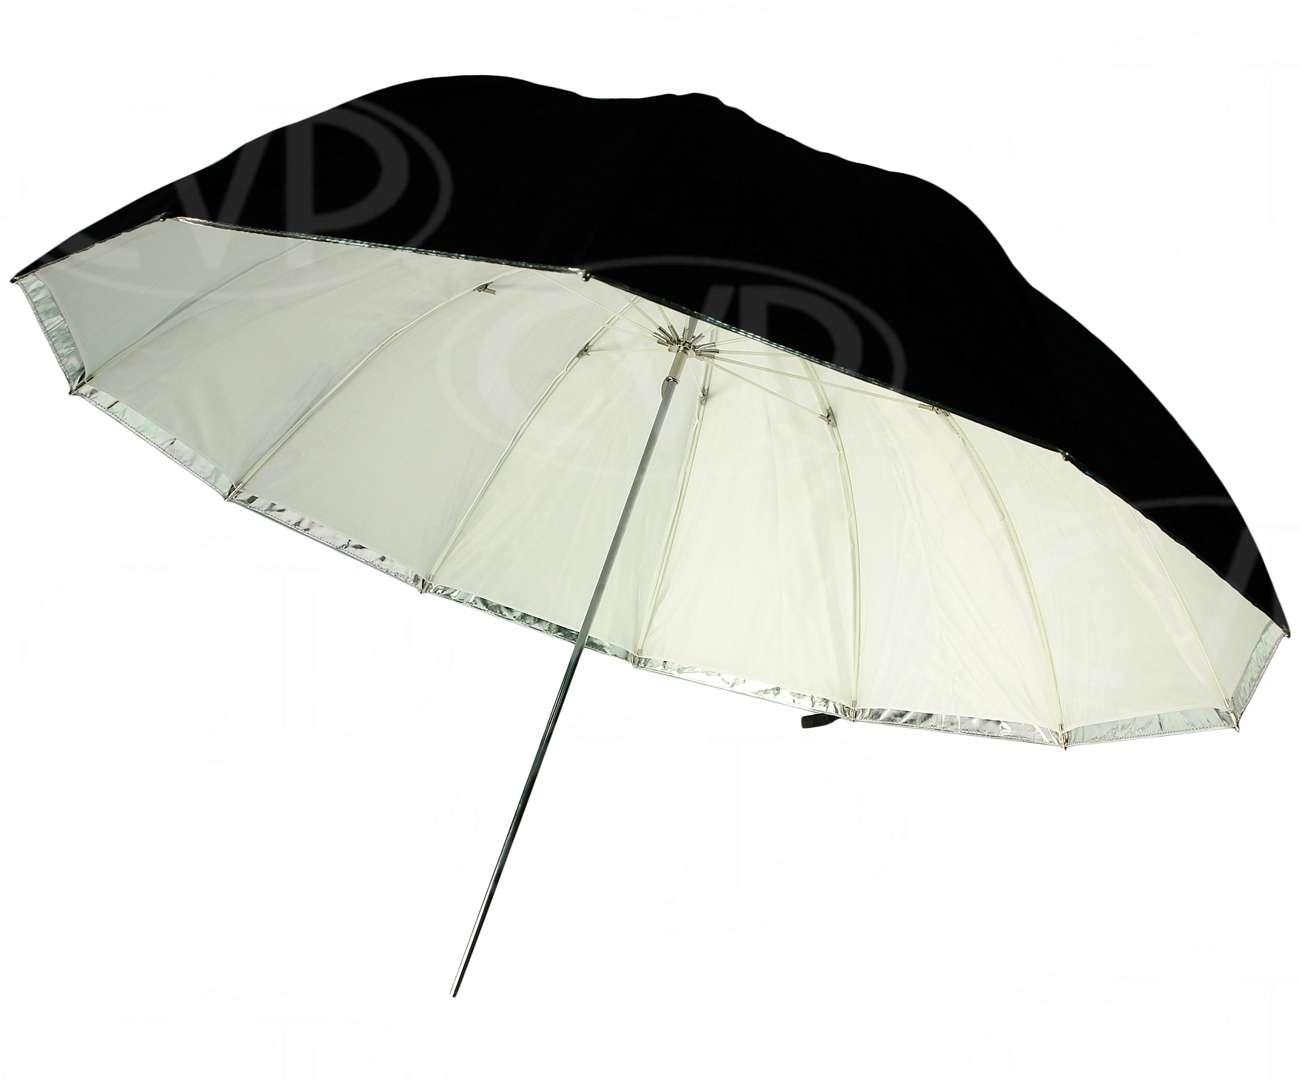 Gekko 64-inch 5-in-1 Gold/Silver and Translucent Jumbo Umbrella (GRU-03)